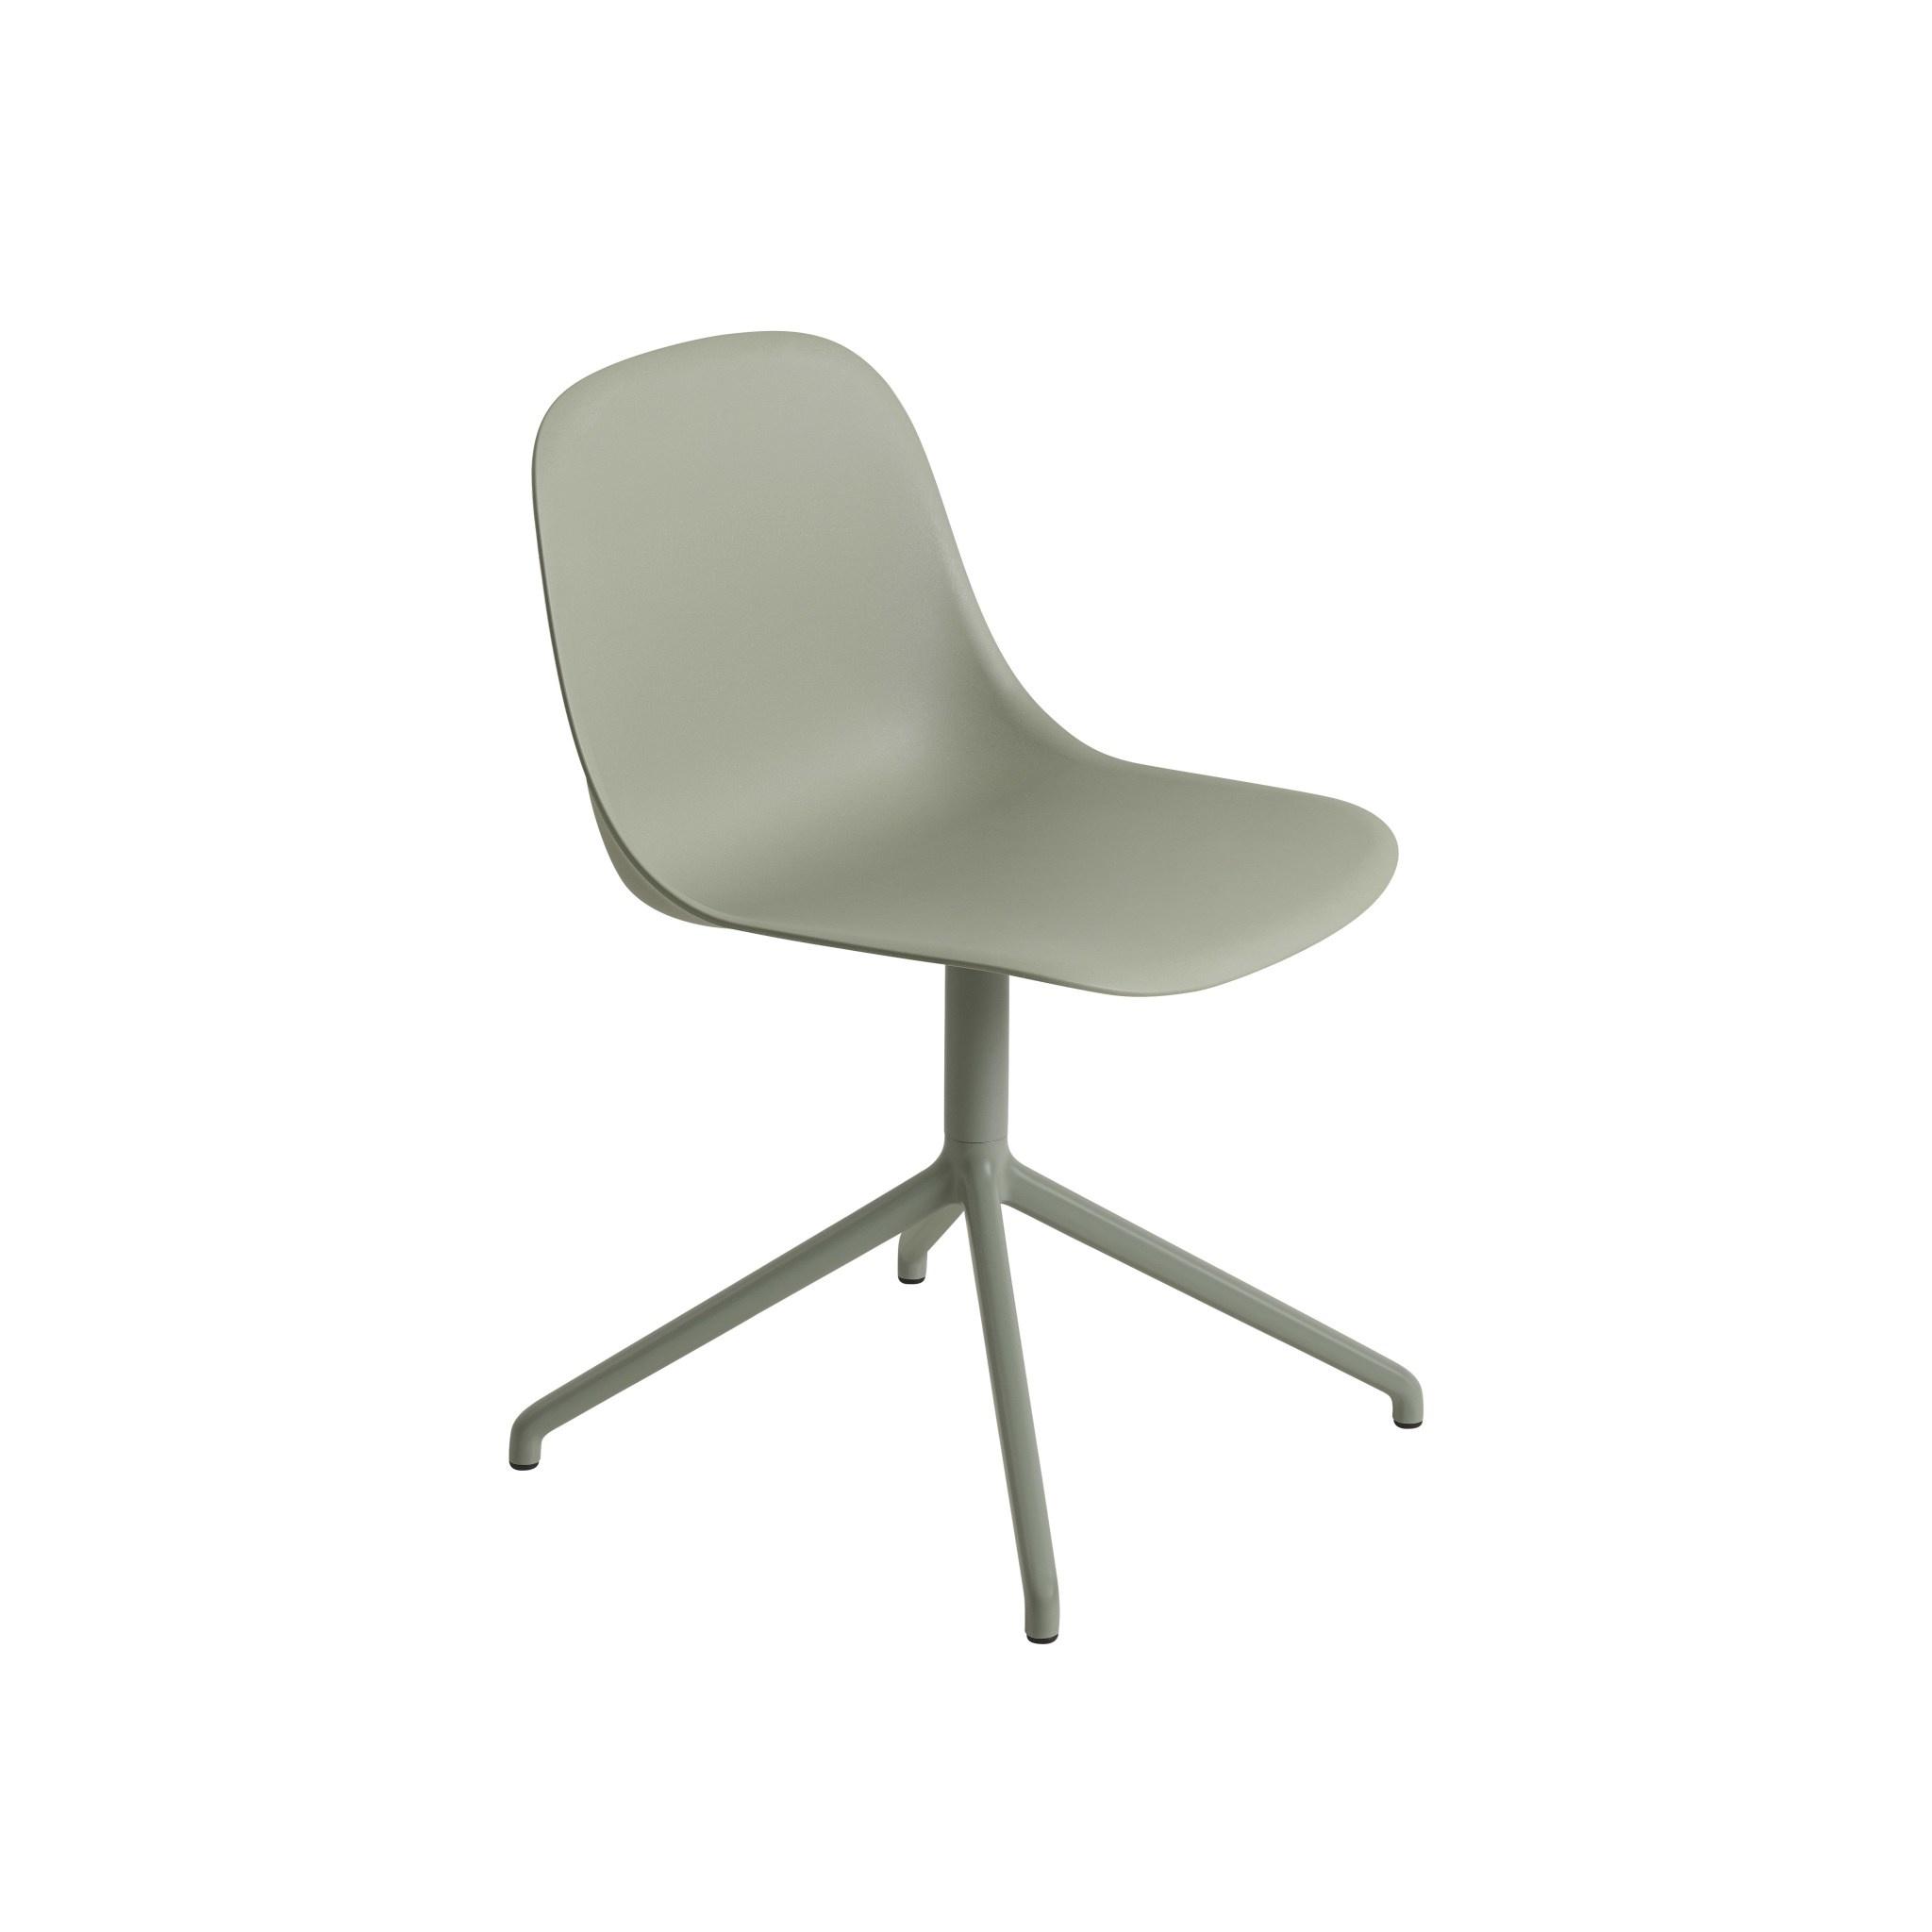 Fiber side chair swivel base w.o. return-5